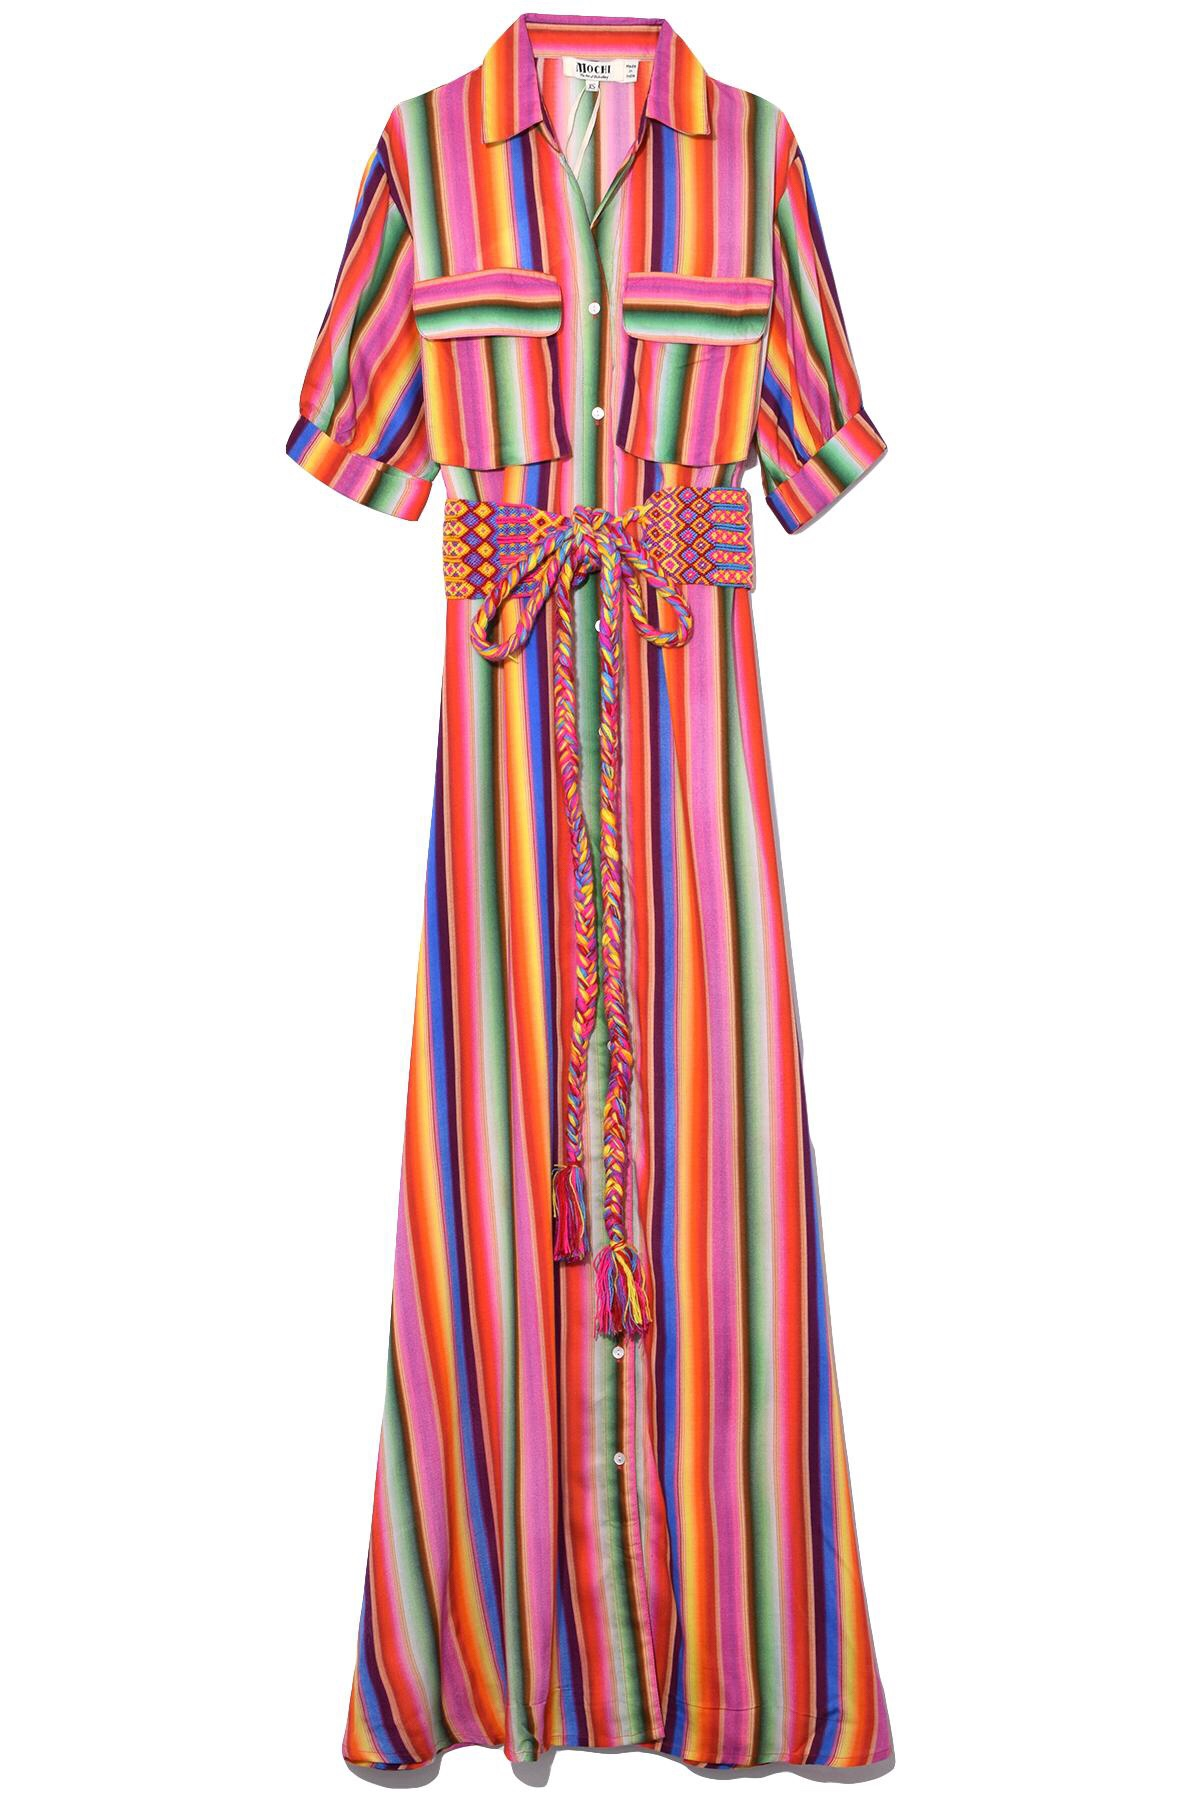 Rainbow dress from Mochi